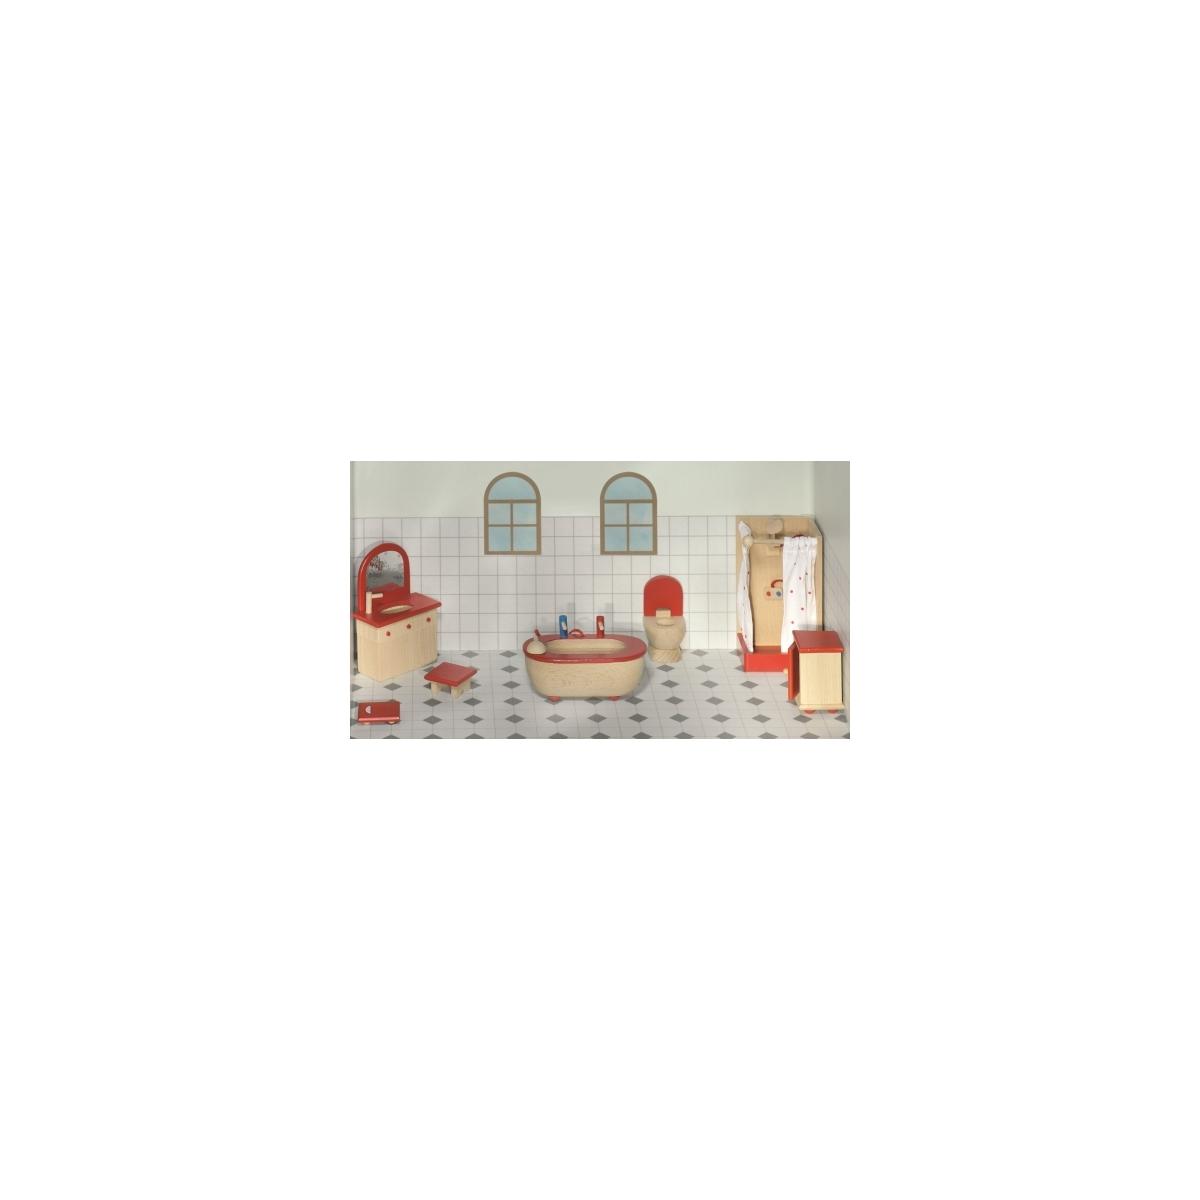 Goki Puppenhausmöbel Badezimmer | Mukk Spielwaren Munster Goki Puppenmobel Badezimmer Gollnest